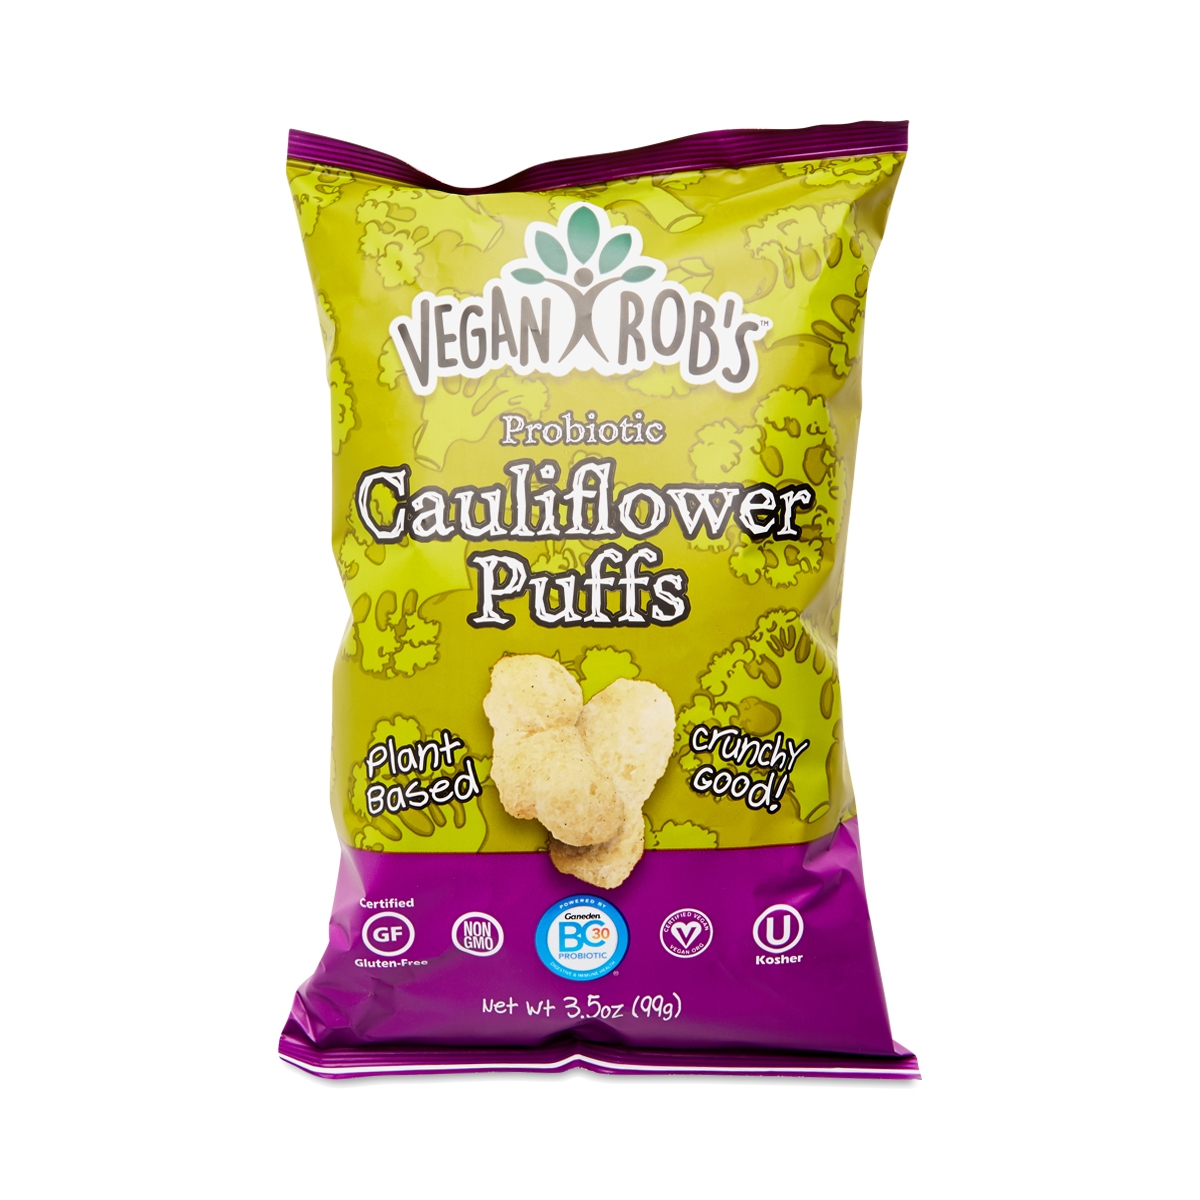 Vegan Rob's Probiotic Cauliflower Puffs 3.5 oz bag